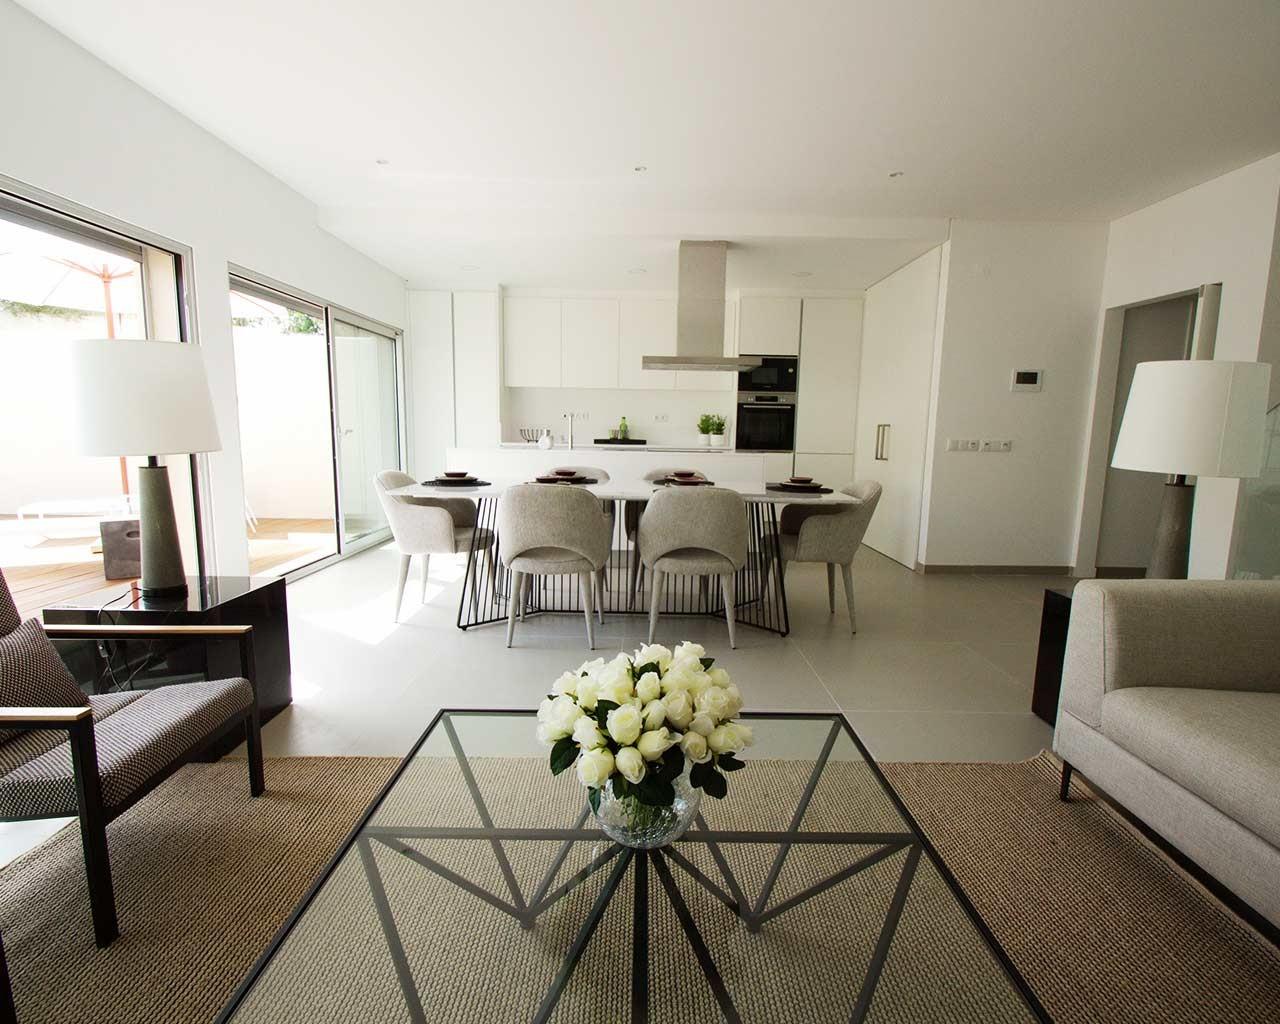 ferragudo-design-villas-sala de estar + cozinha